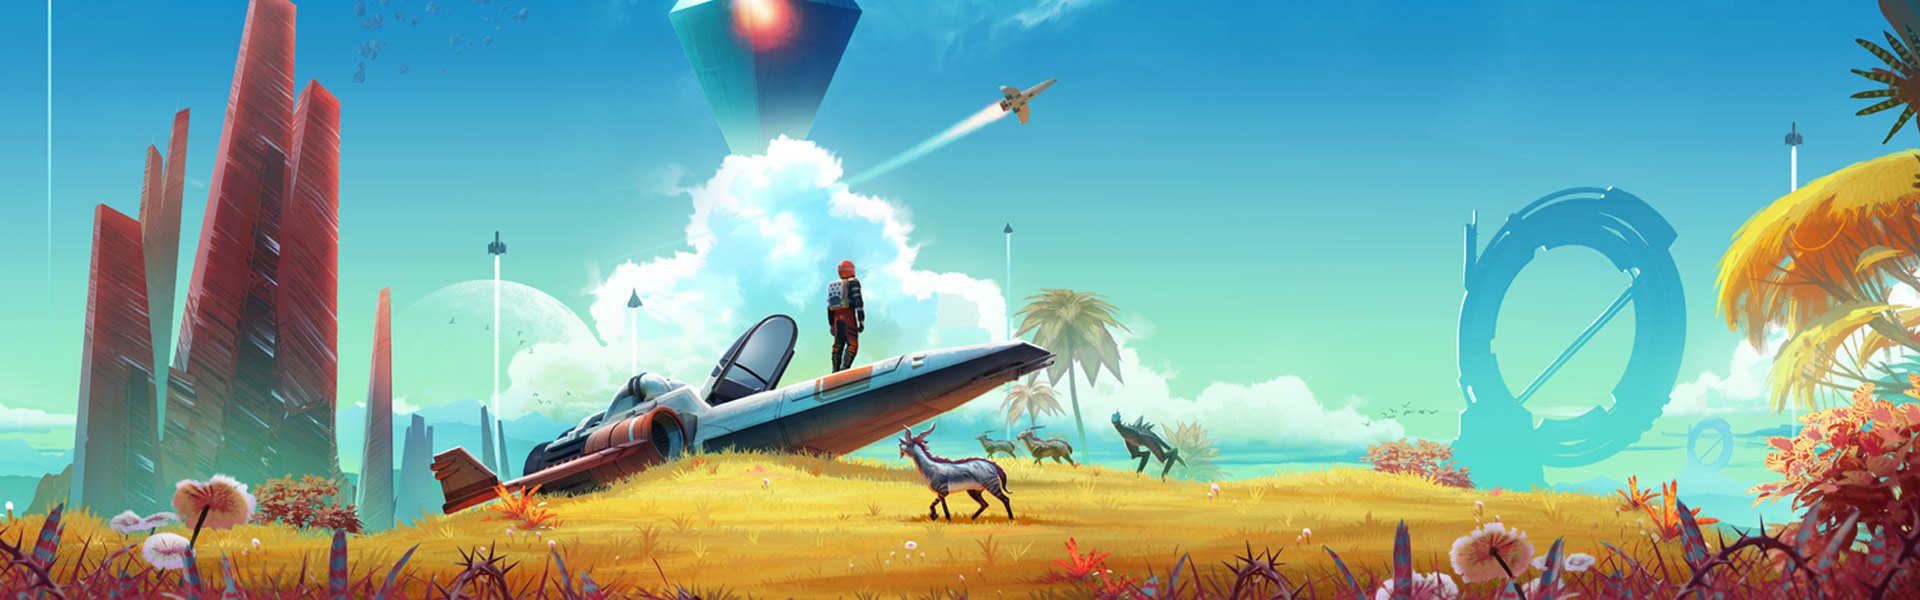 No Man's Sky: L'Ascesa dell'Atlante